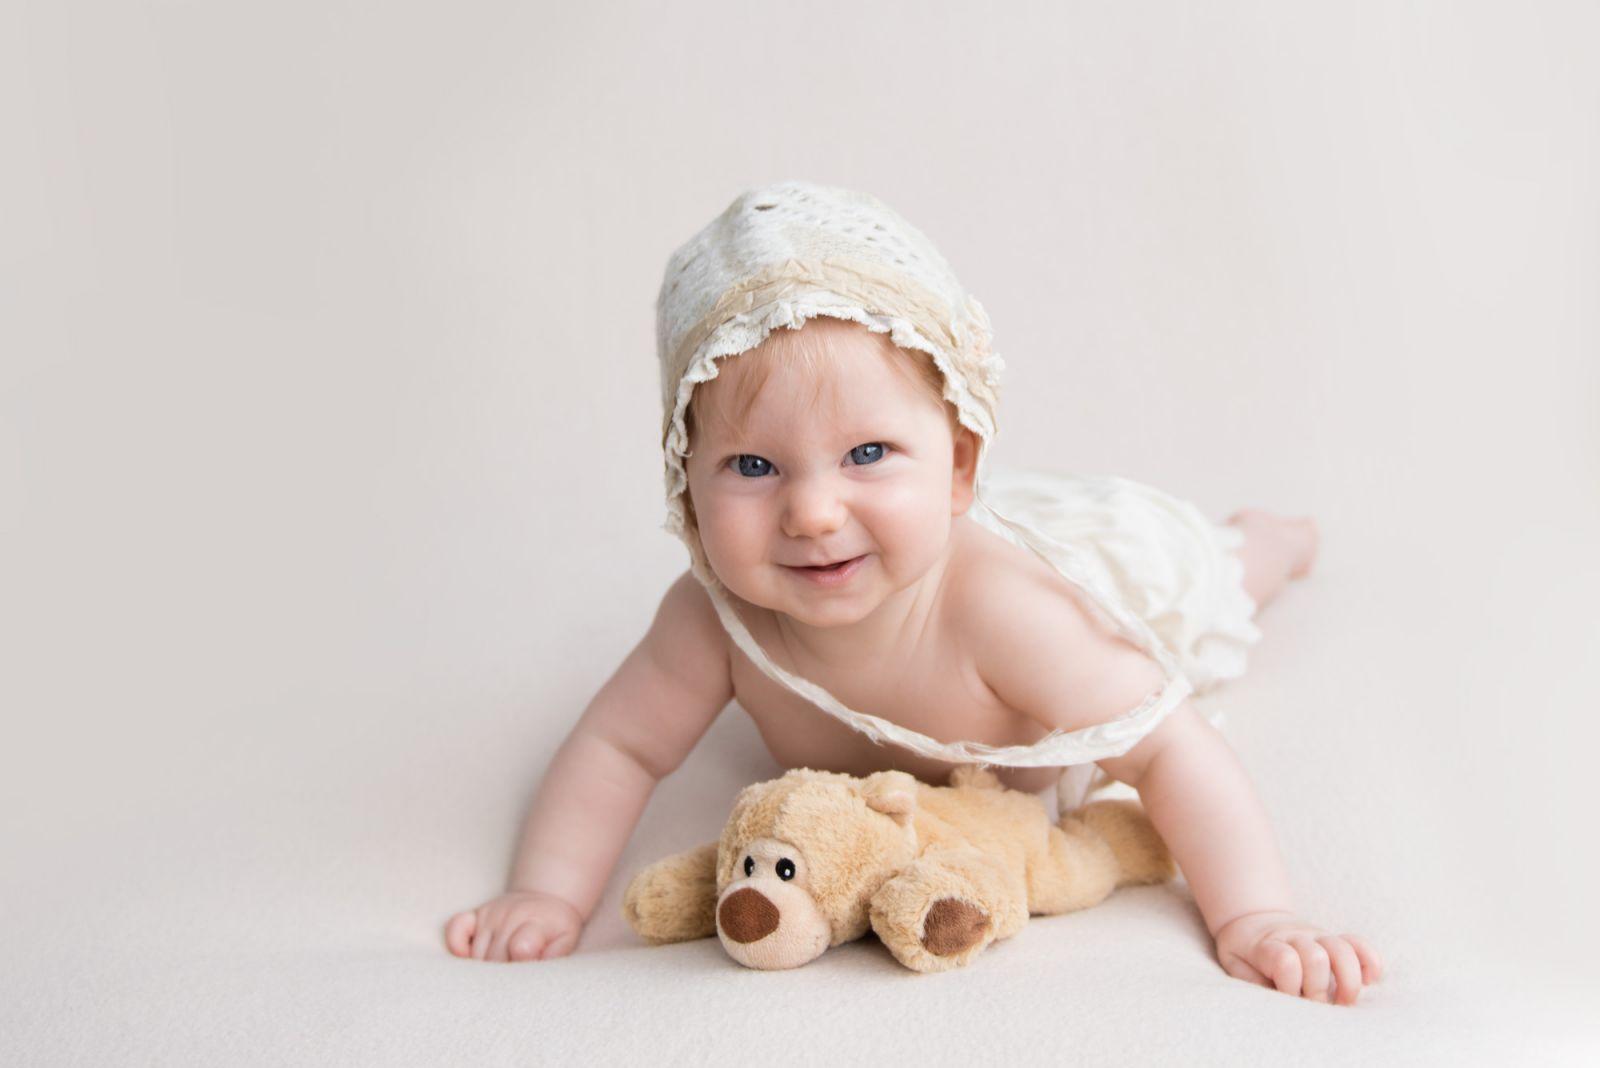 Baby Neugeborenen Fotoshooting Newborn Fotografie Kinderfoto 12 Farbe